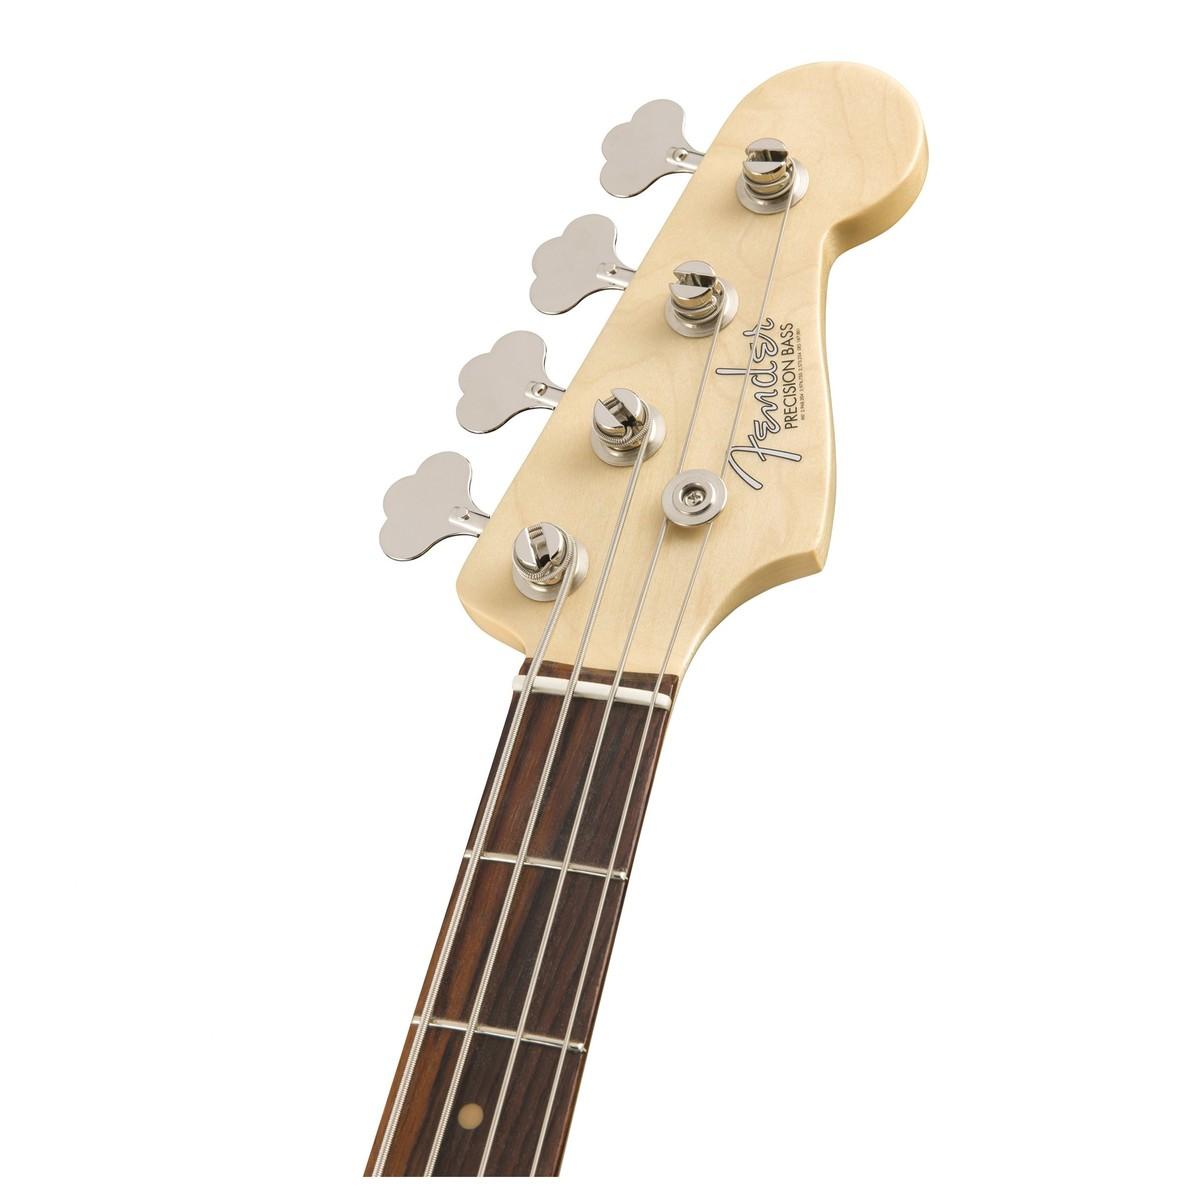 Fender American Original 60s P Bass Rw 3 Tone Sunburst At Gear4music Accurate Control